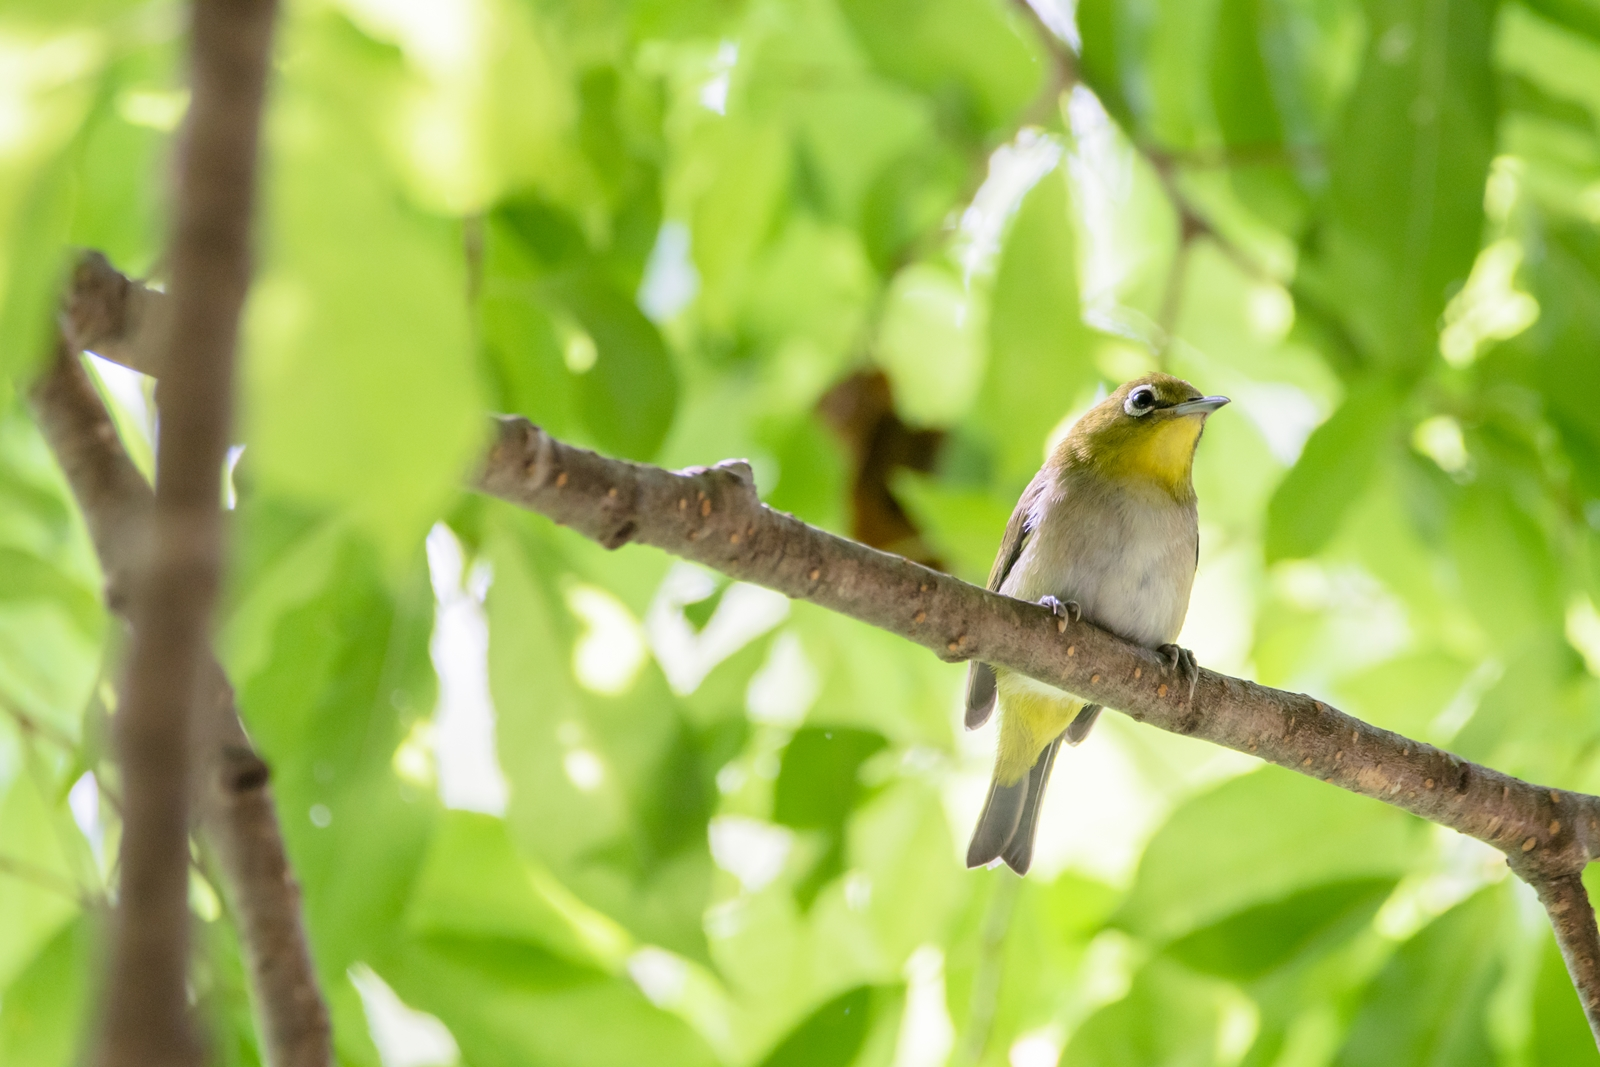 Photo: 「落ち着く緑」 / Calm green.  ここが落ち着く この季節が落ち着く 居心地のいい色 緑に包まれる季節  Japanese White-eye. (メジロ)  Nikon D500 SIGMA 150-600mm F5-6.3 DG OS HSM Contemporary  #birdphotography #birds #kawaii #ことり #小鳥 #nikon #sigma  ( http://takafumiooshio.com/archives/2752 )